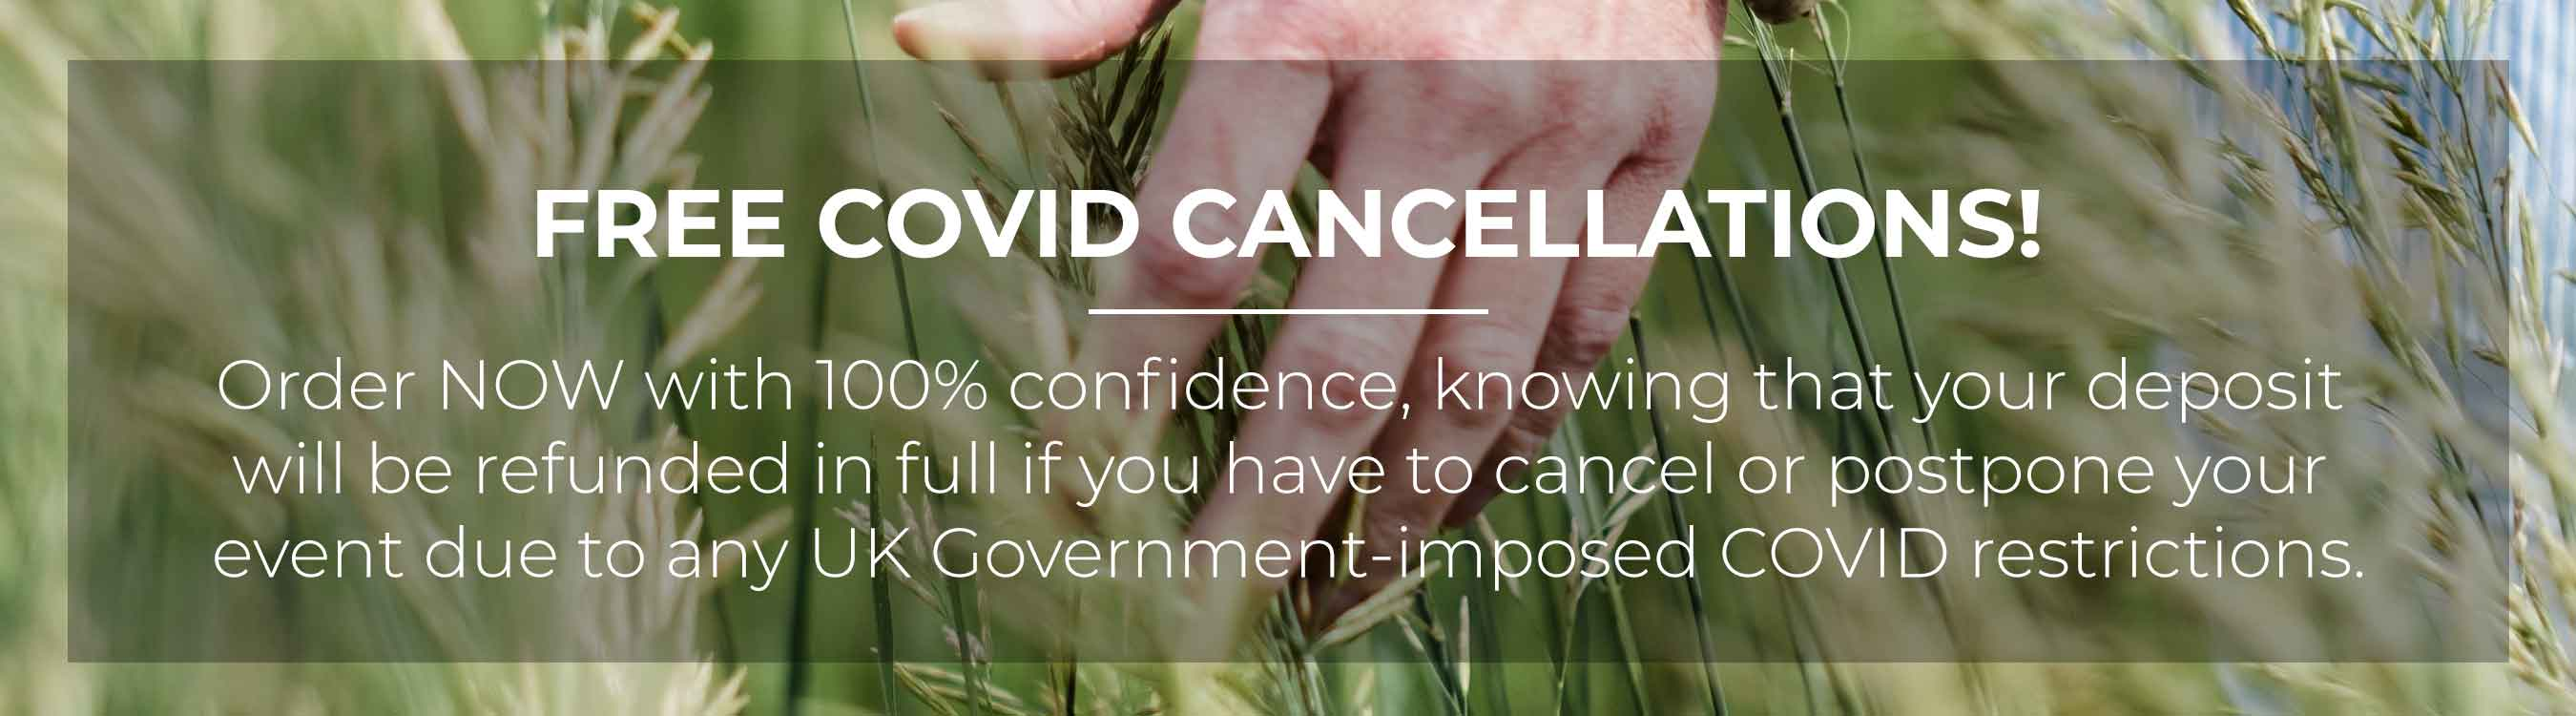 Free COVID cancellations